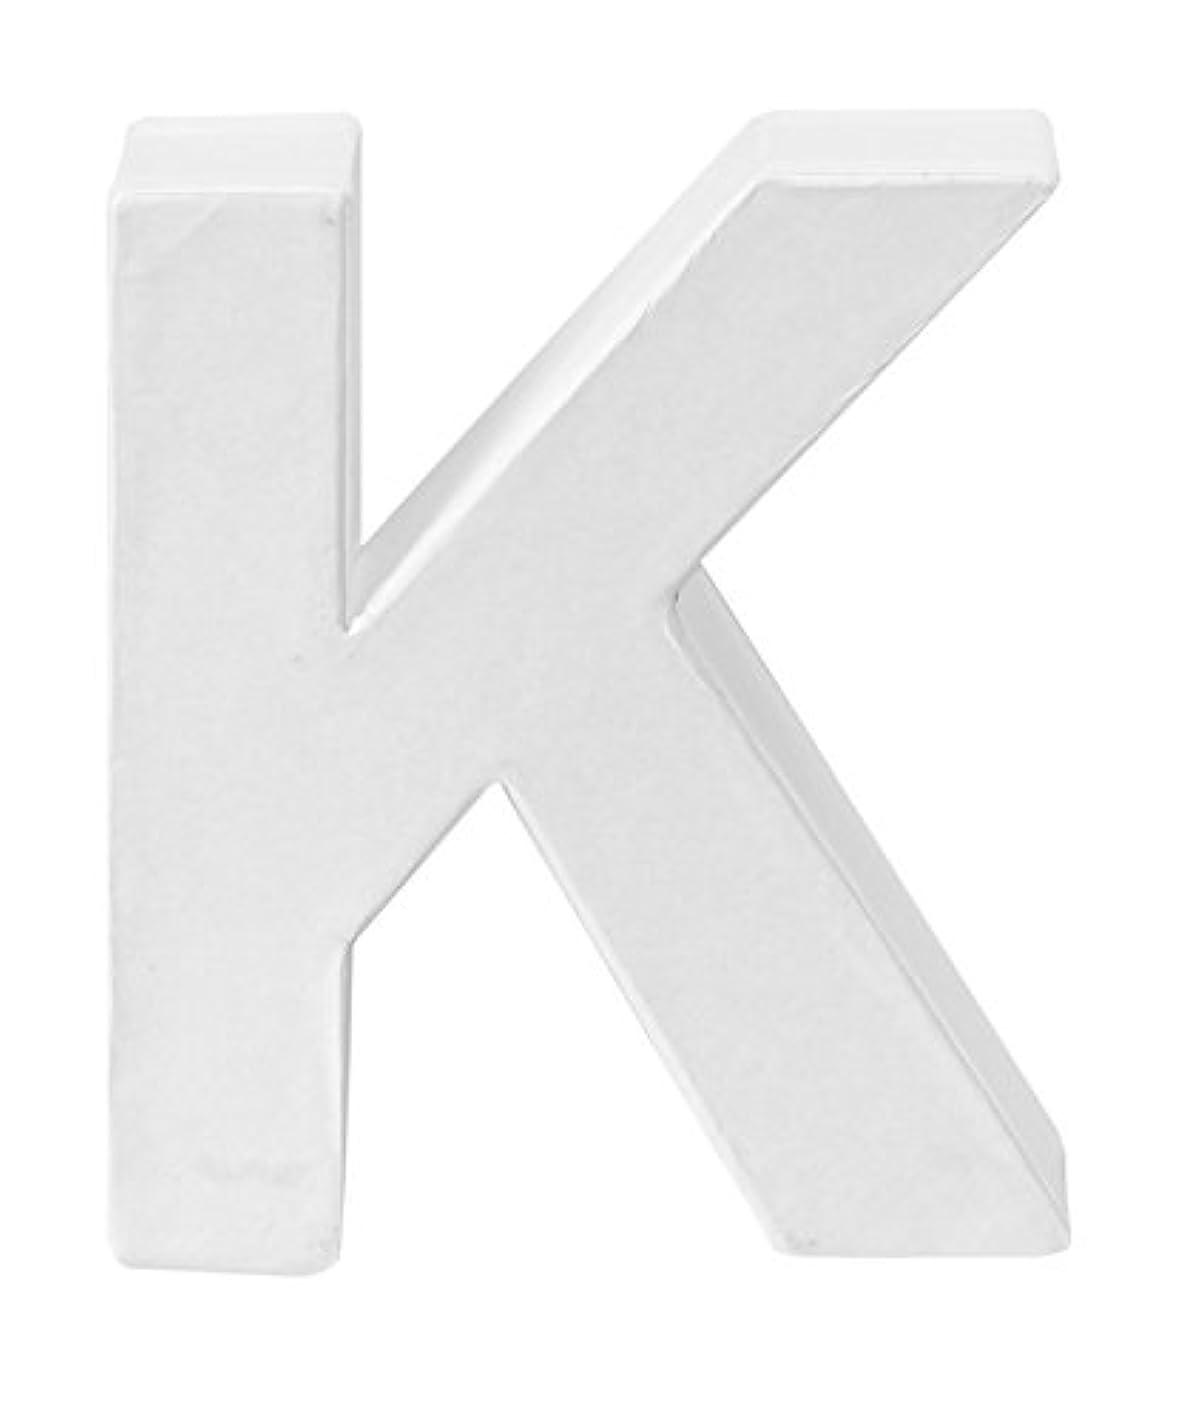 Glorex Cardboard Letter K FSC Mix, 10?x 8?x 3.5?cm White